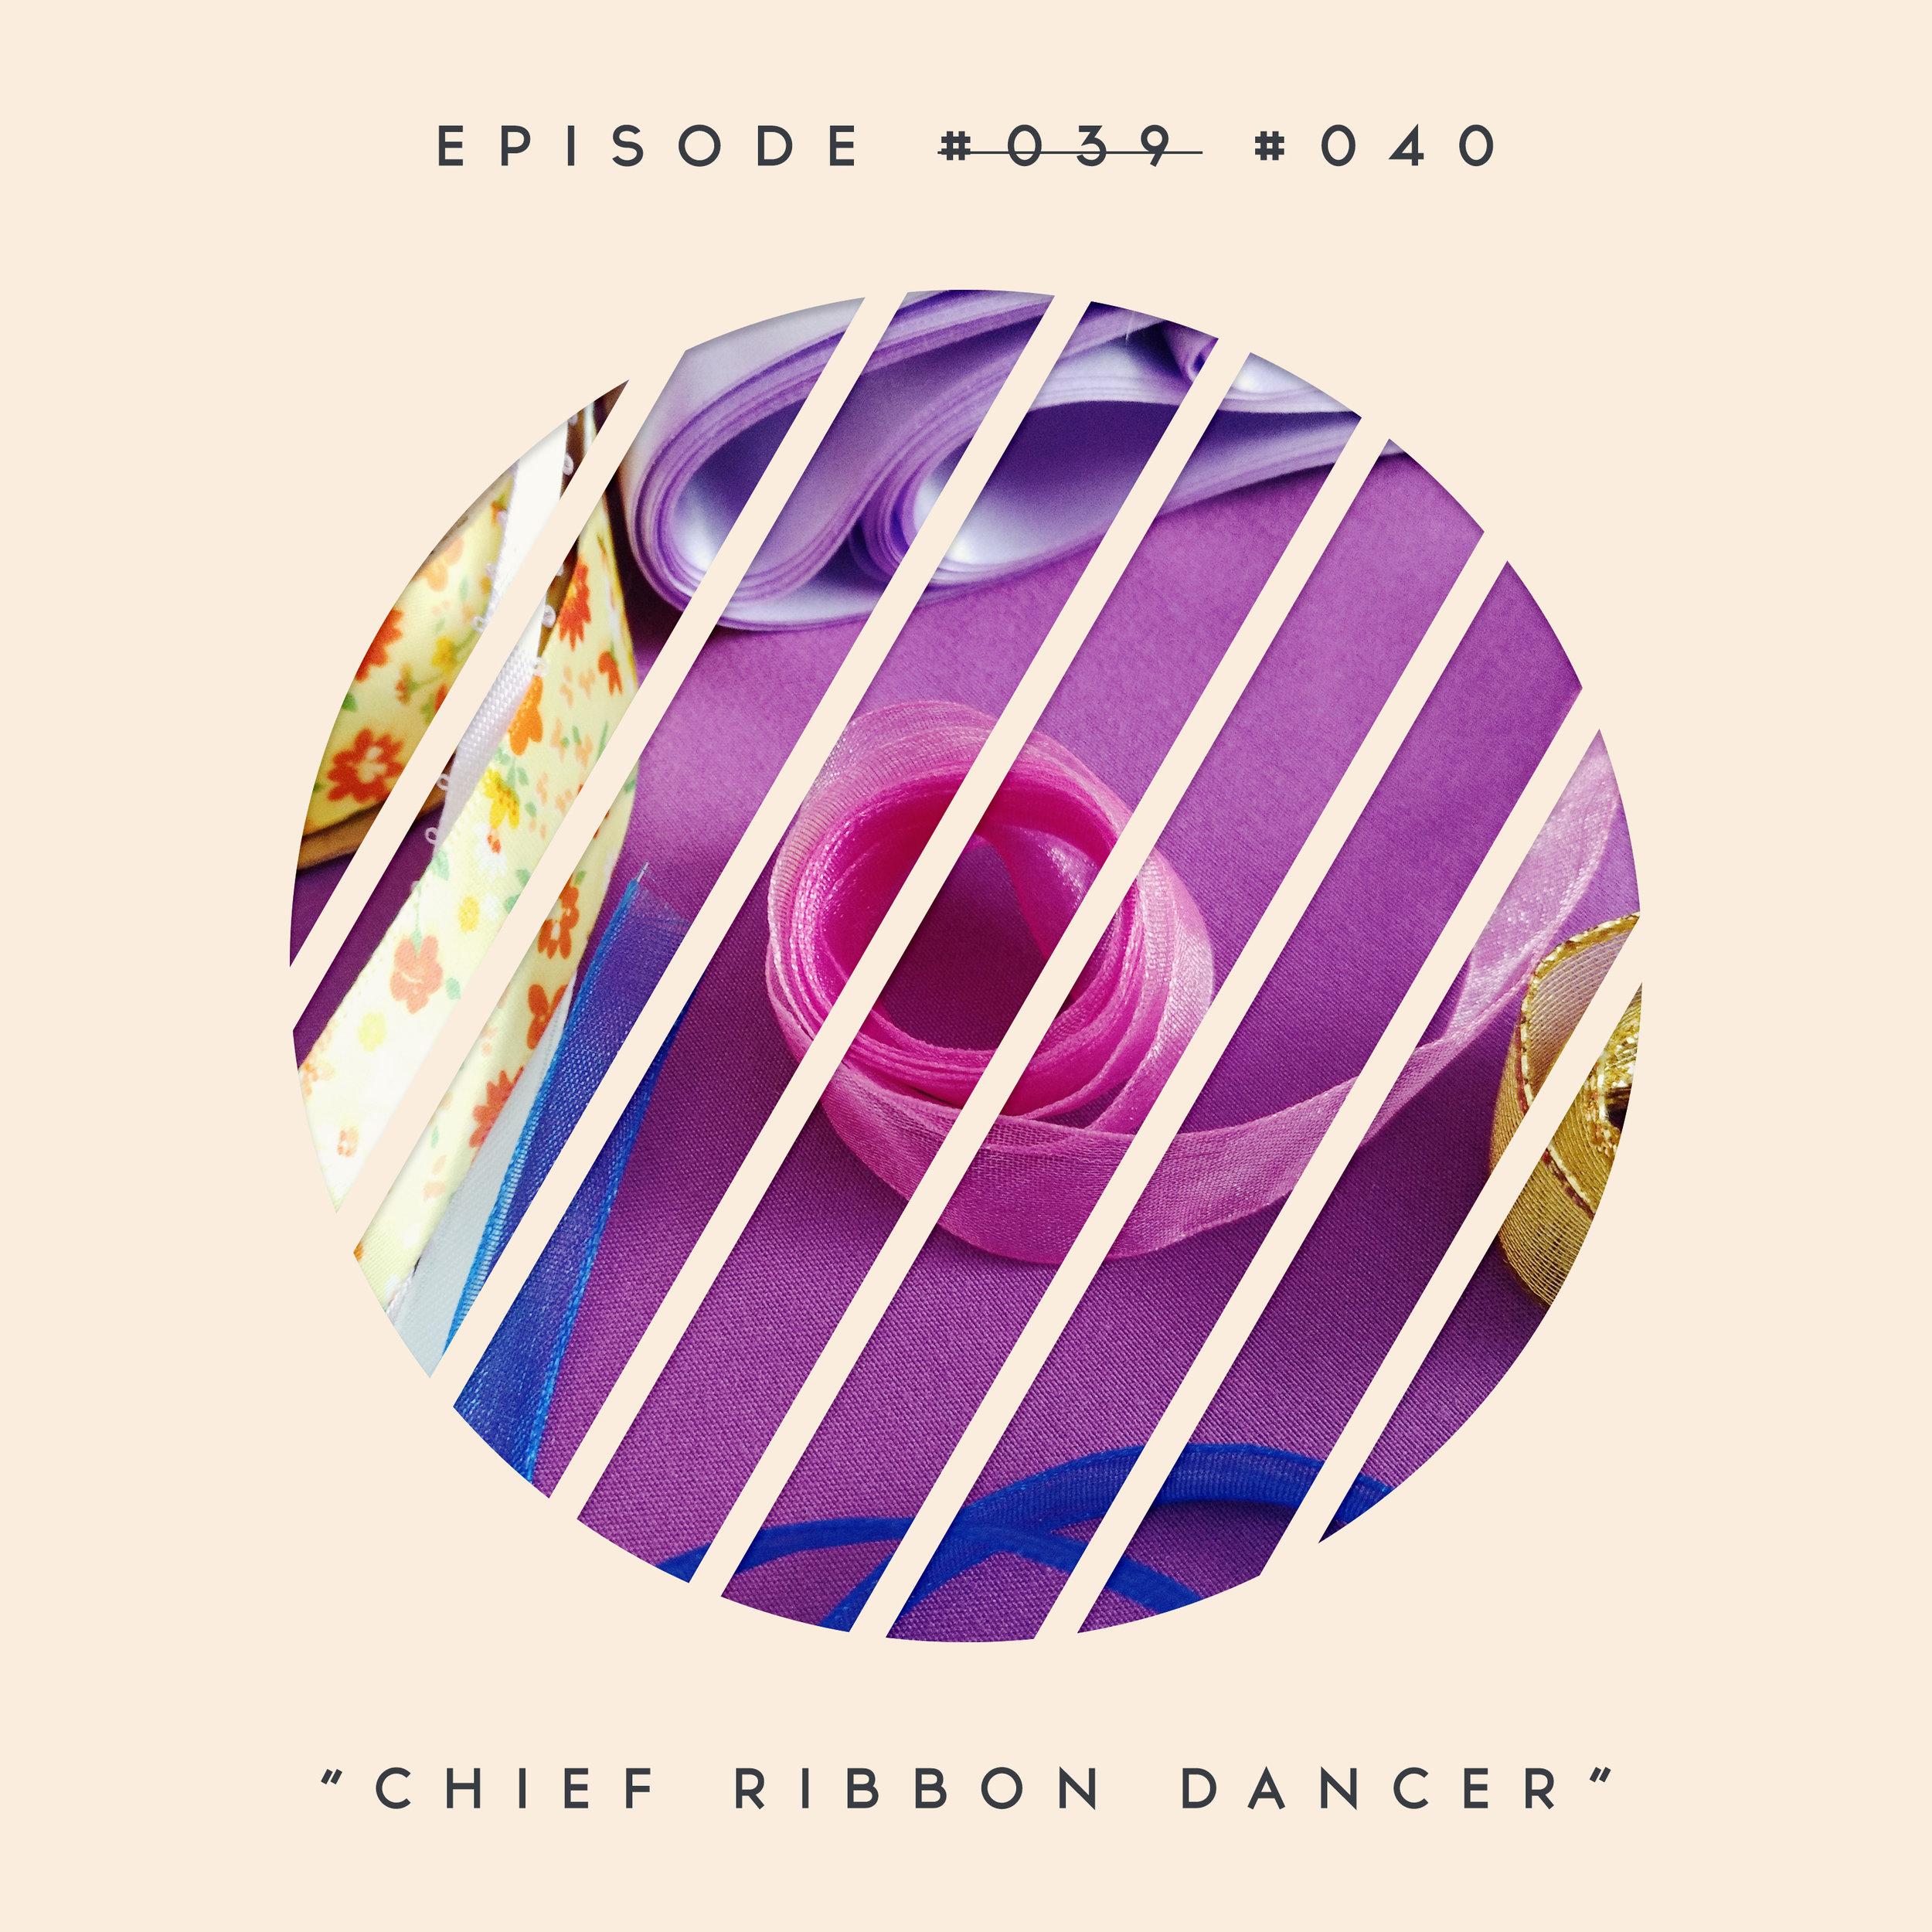 Chief-Ribbon-Dancer.jpg